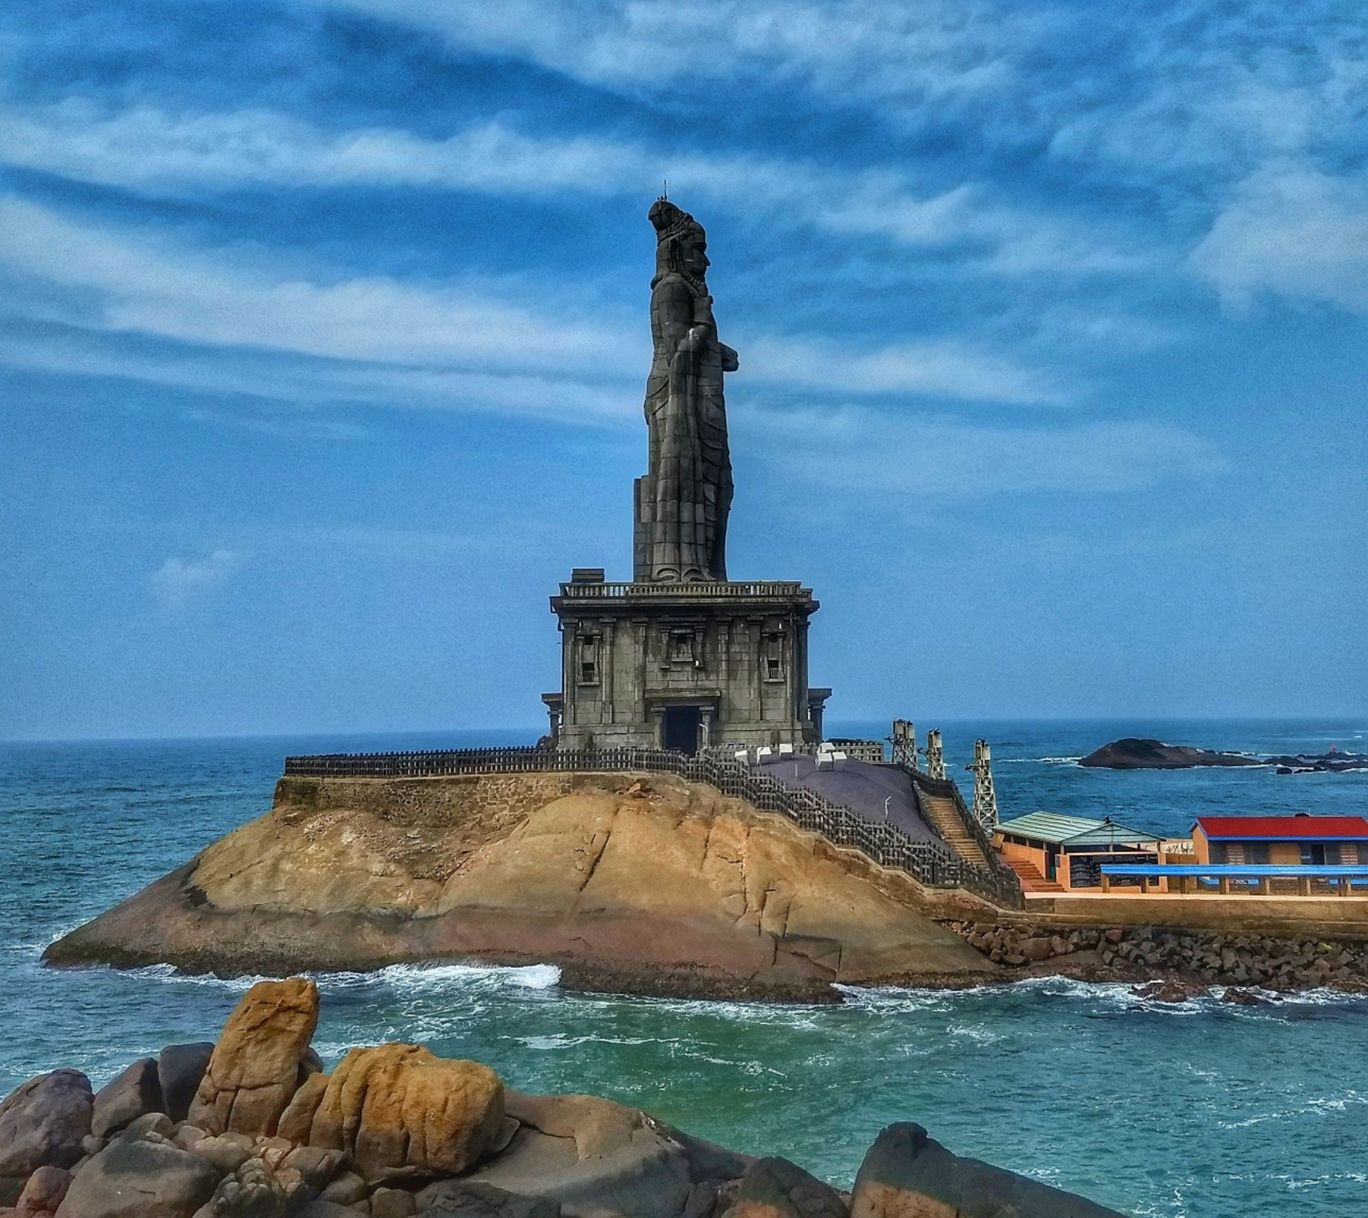 Photo of Vivekananda Rock Memorial By Vivek Jaiswal